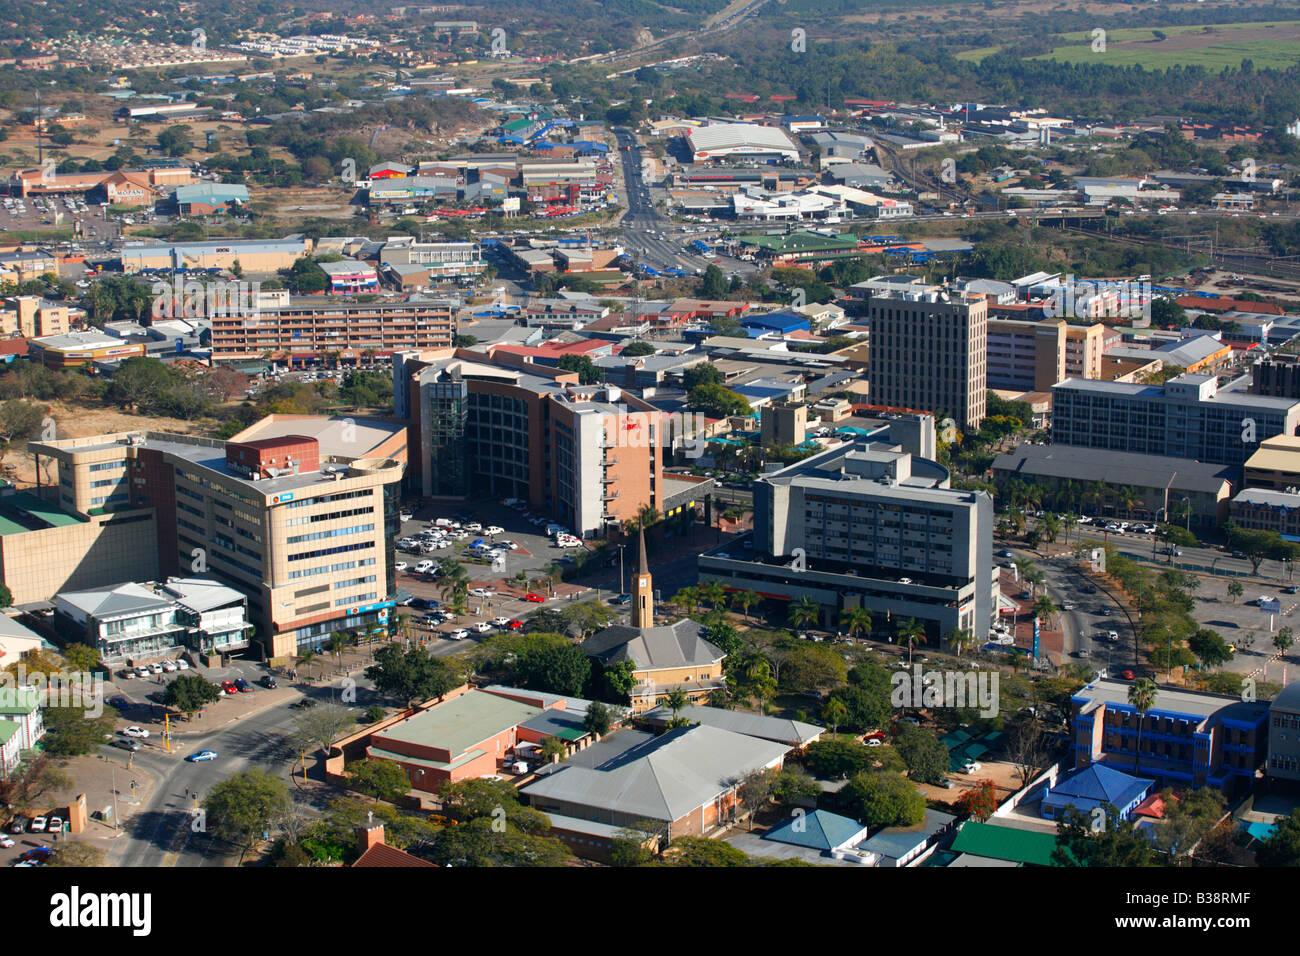 Aerial view of the Nelspruit CBD - Stock Image